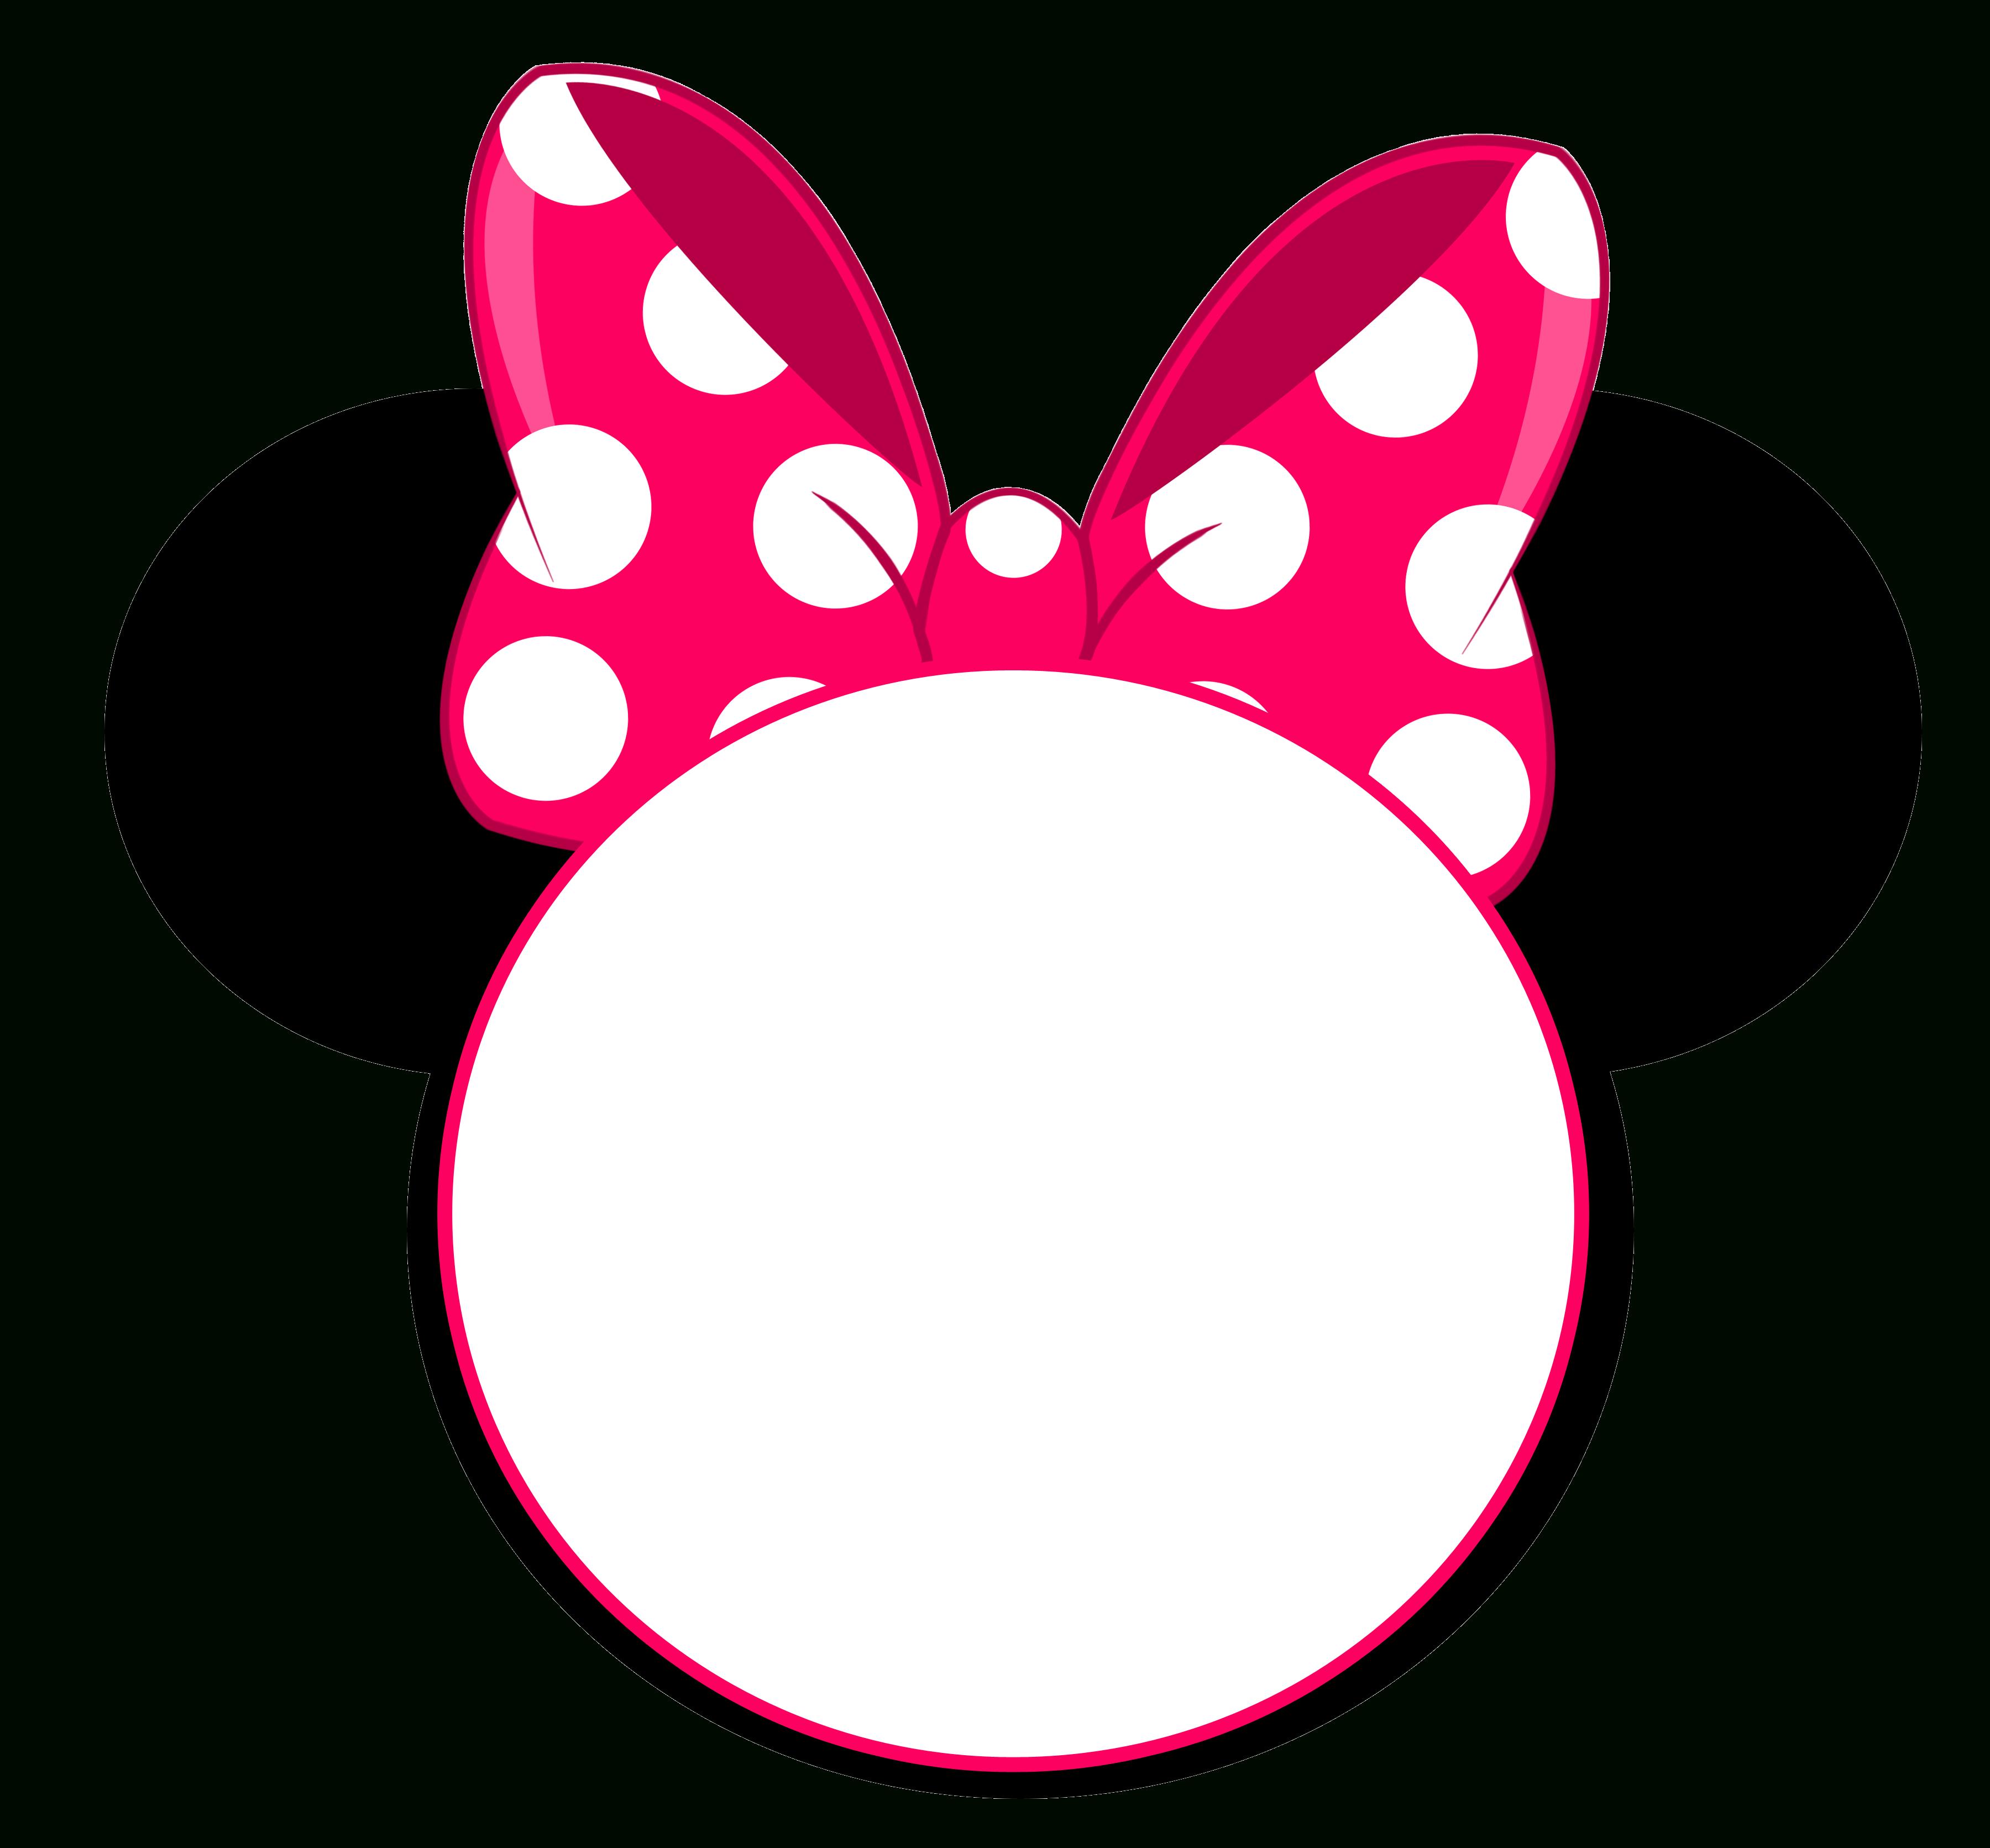 Free Printable Minnie Mouse Pinky Birthday Invitation | Minnie's - Free Minnie Mouse Printable Templates